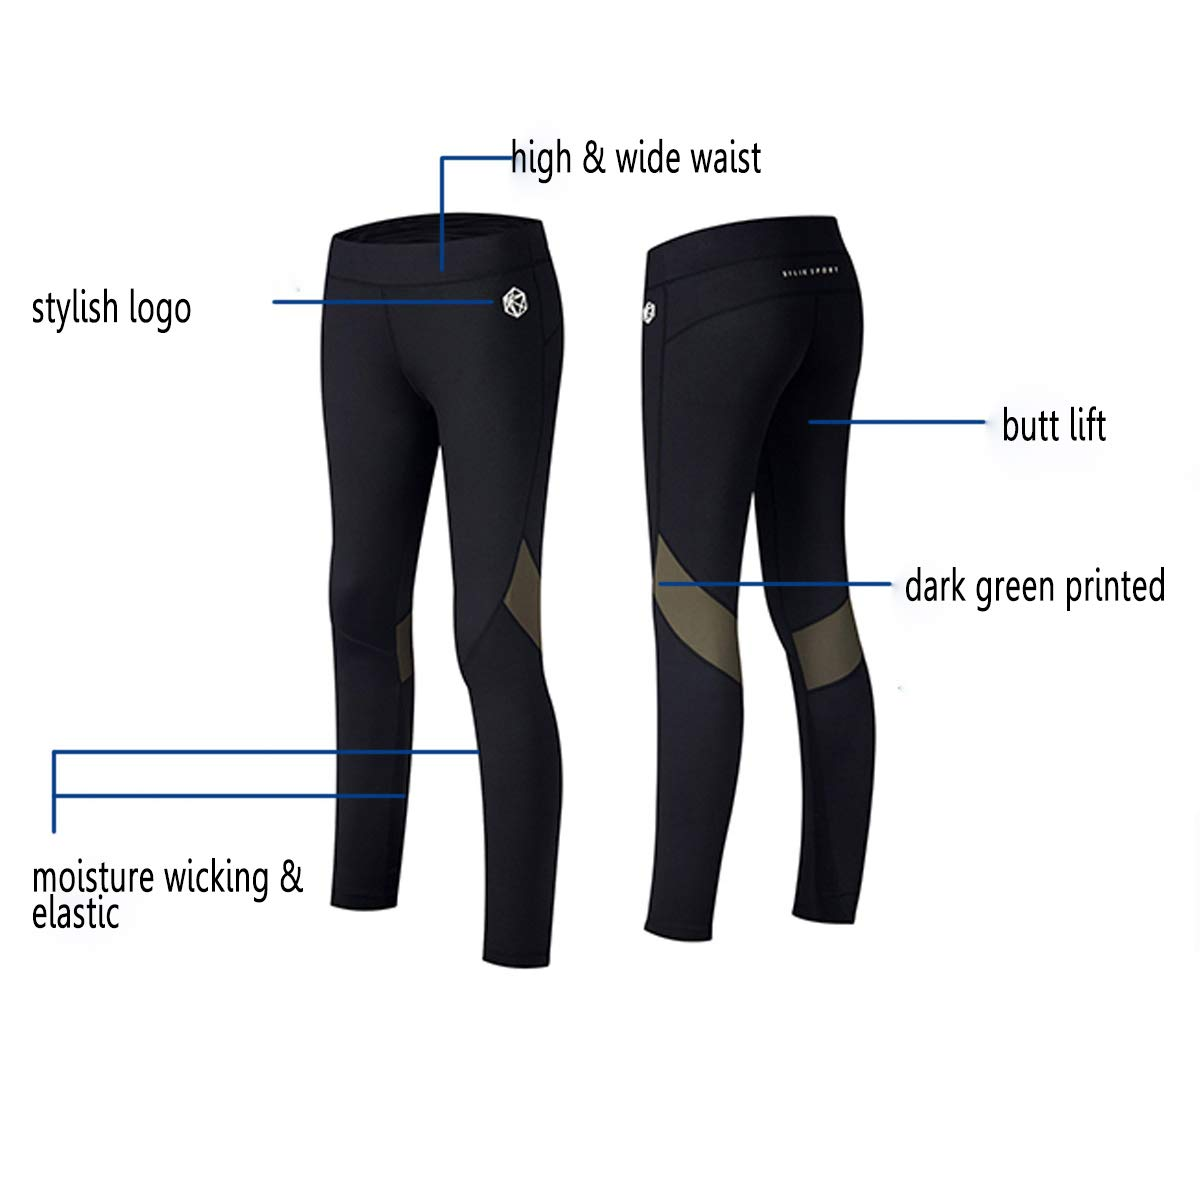 Mujer Silik Pantalons Deportivos De Empalme Con Bolsillo De Cintura Alta Pantalones De Yoga De Tela De Malla Elasticos Para Mujer Ropa Brandknewmag Com